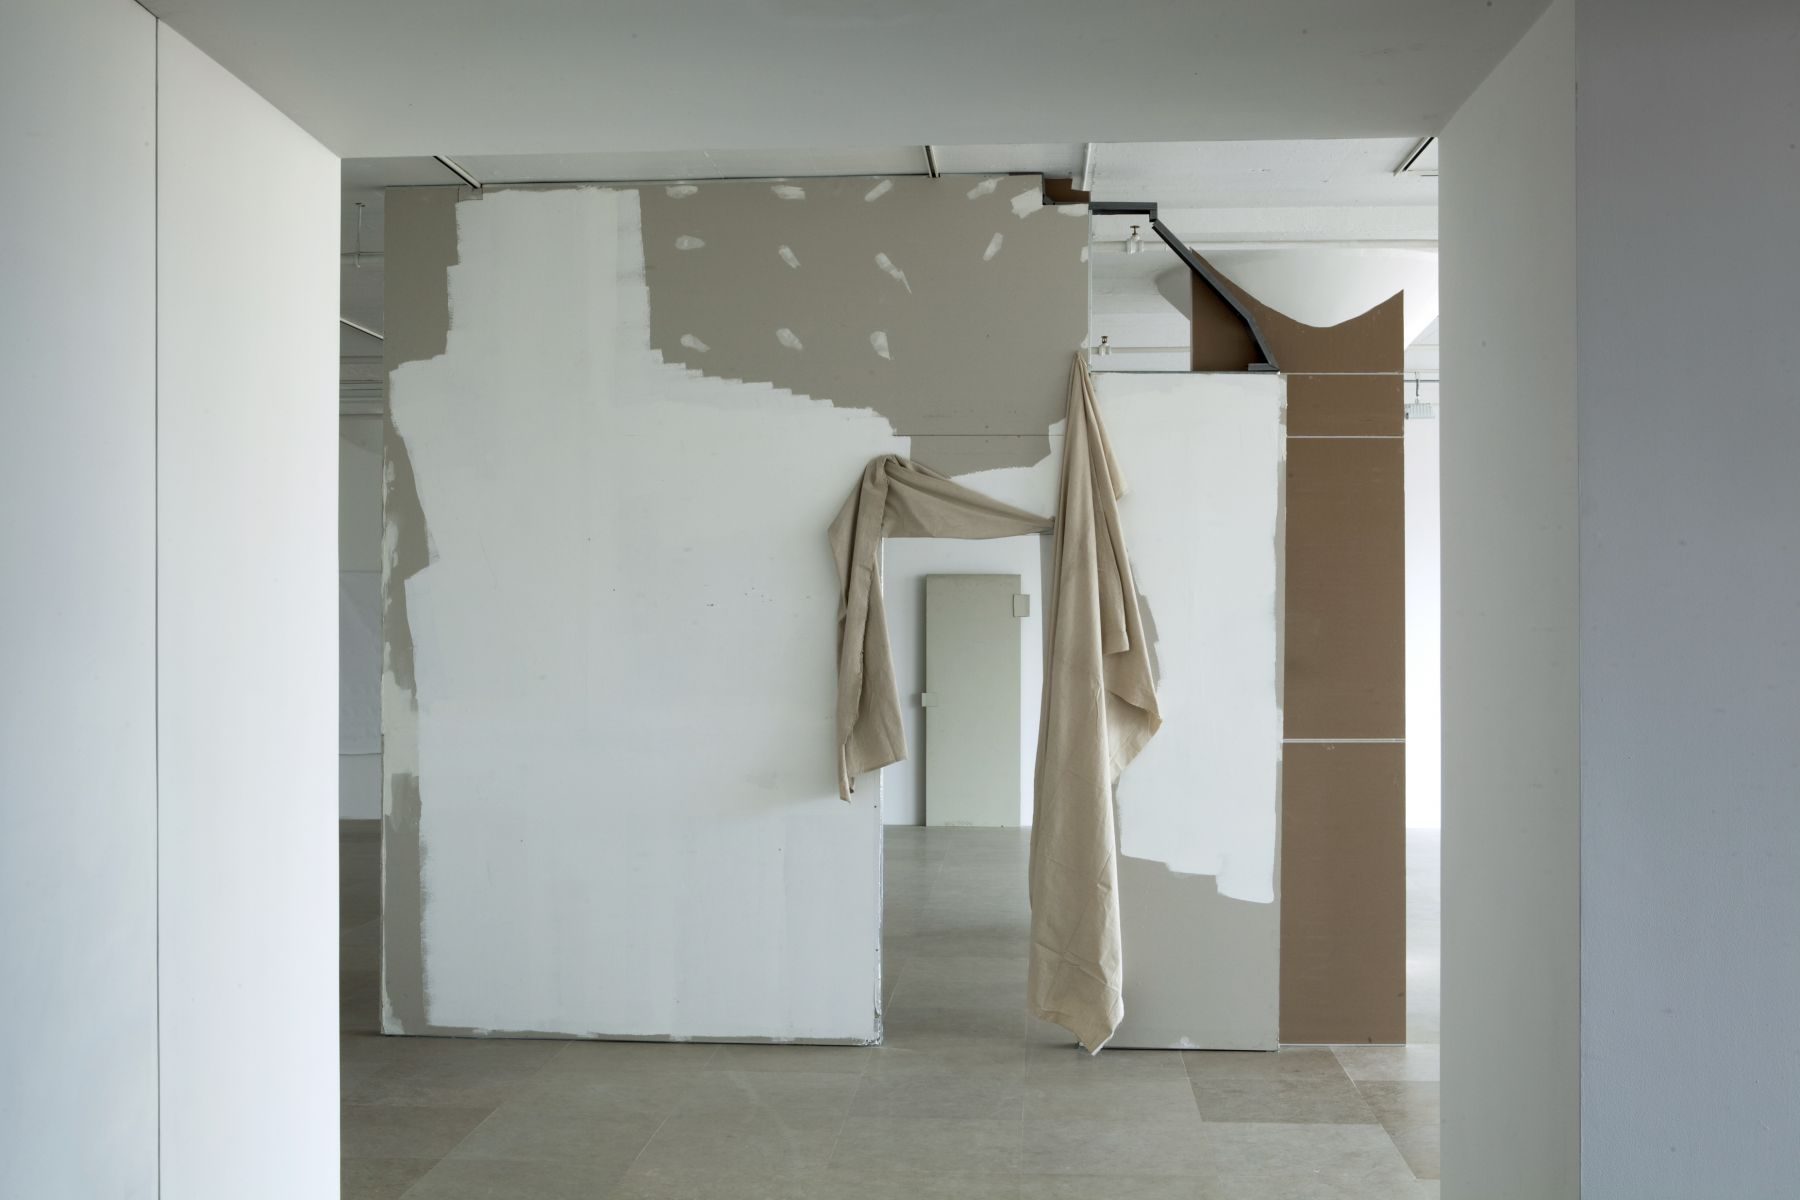 Gedi Sibony The Cutters, 2007 / 2010 Sheetrock wall, paint, hollow core door fragment, vinyl, canvas drop cloth, metallic tape 137 x 164 x 13 inches 348 x 416.6 x 33 cm